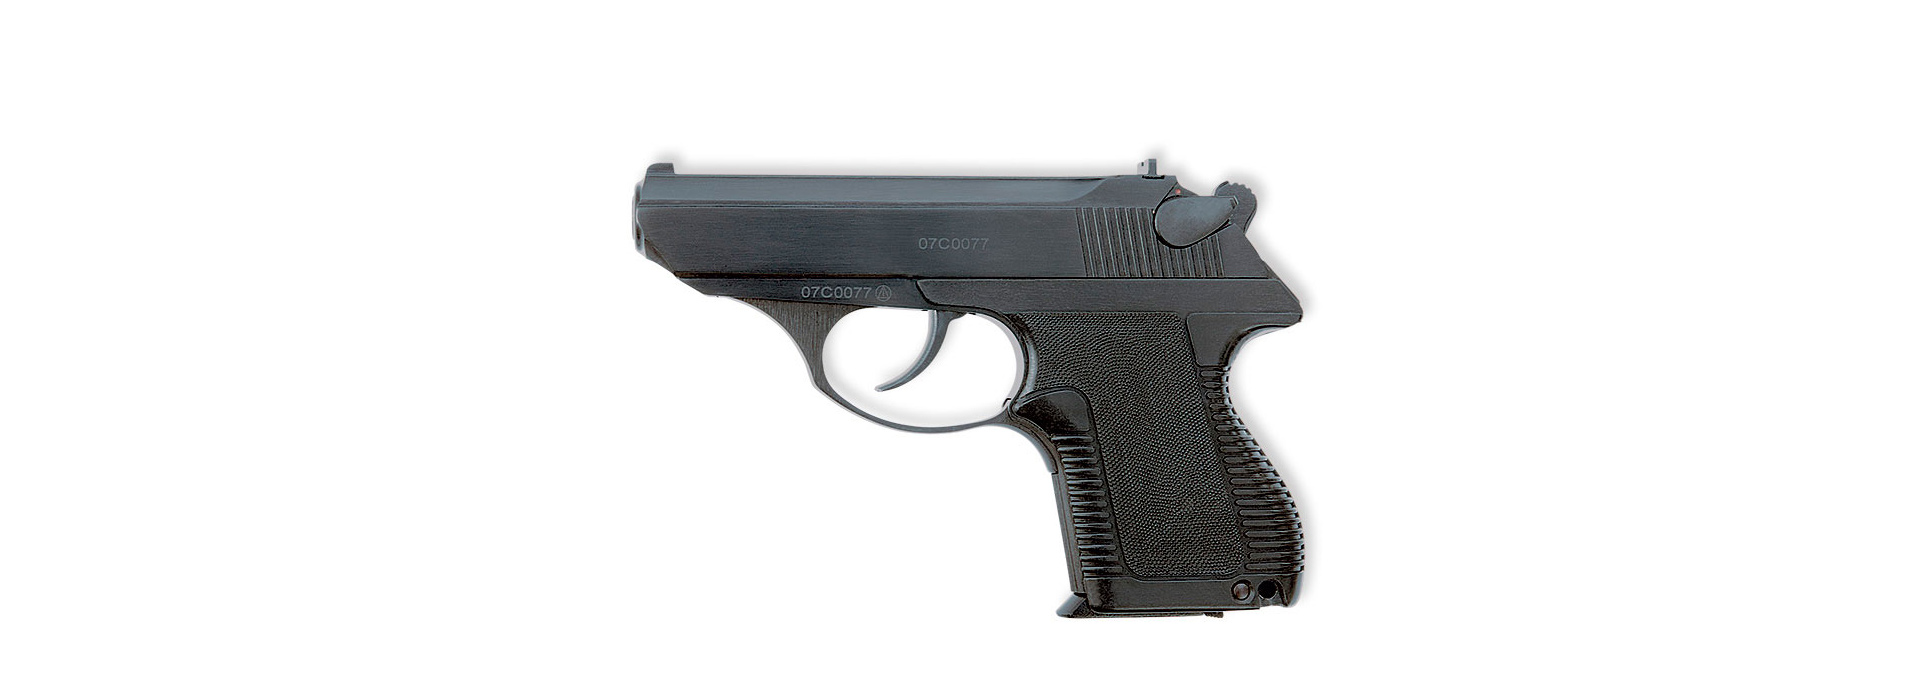 Pistol PSM: specifications, photos 7